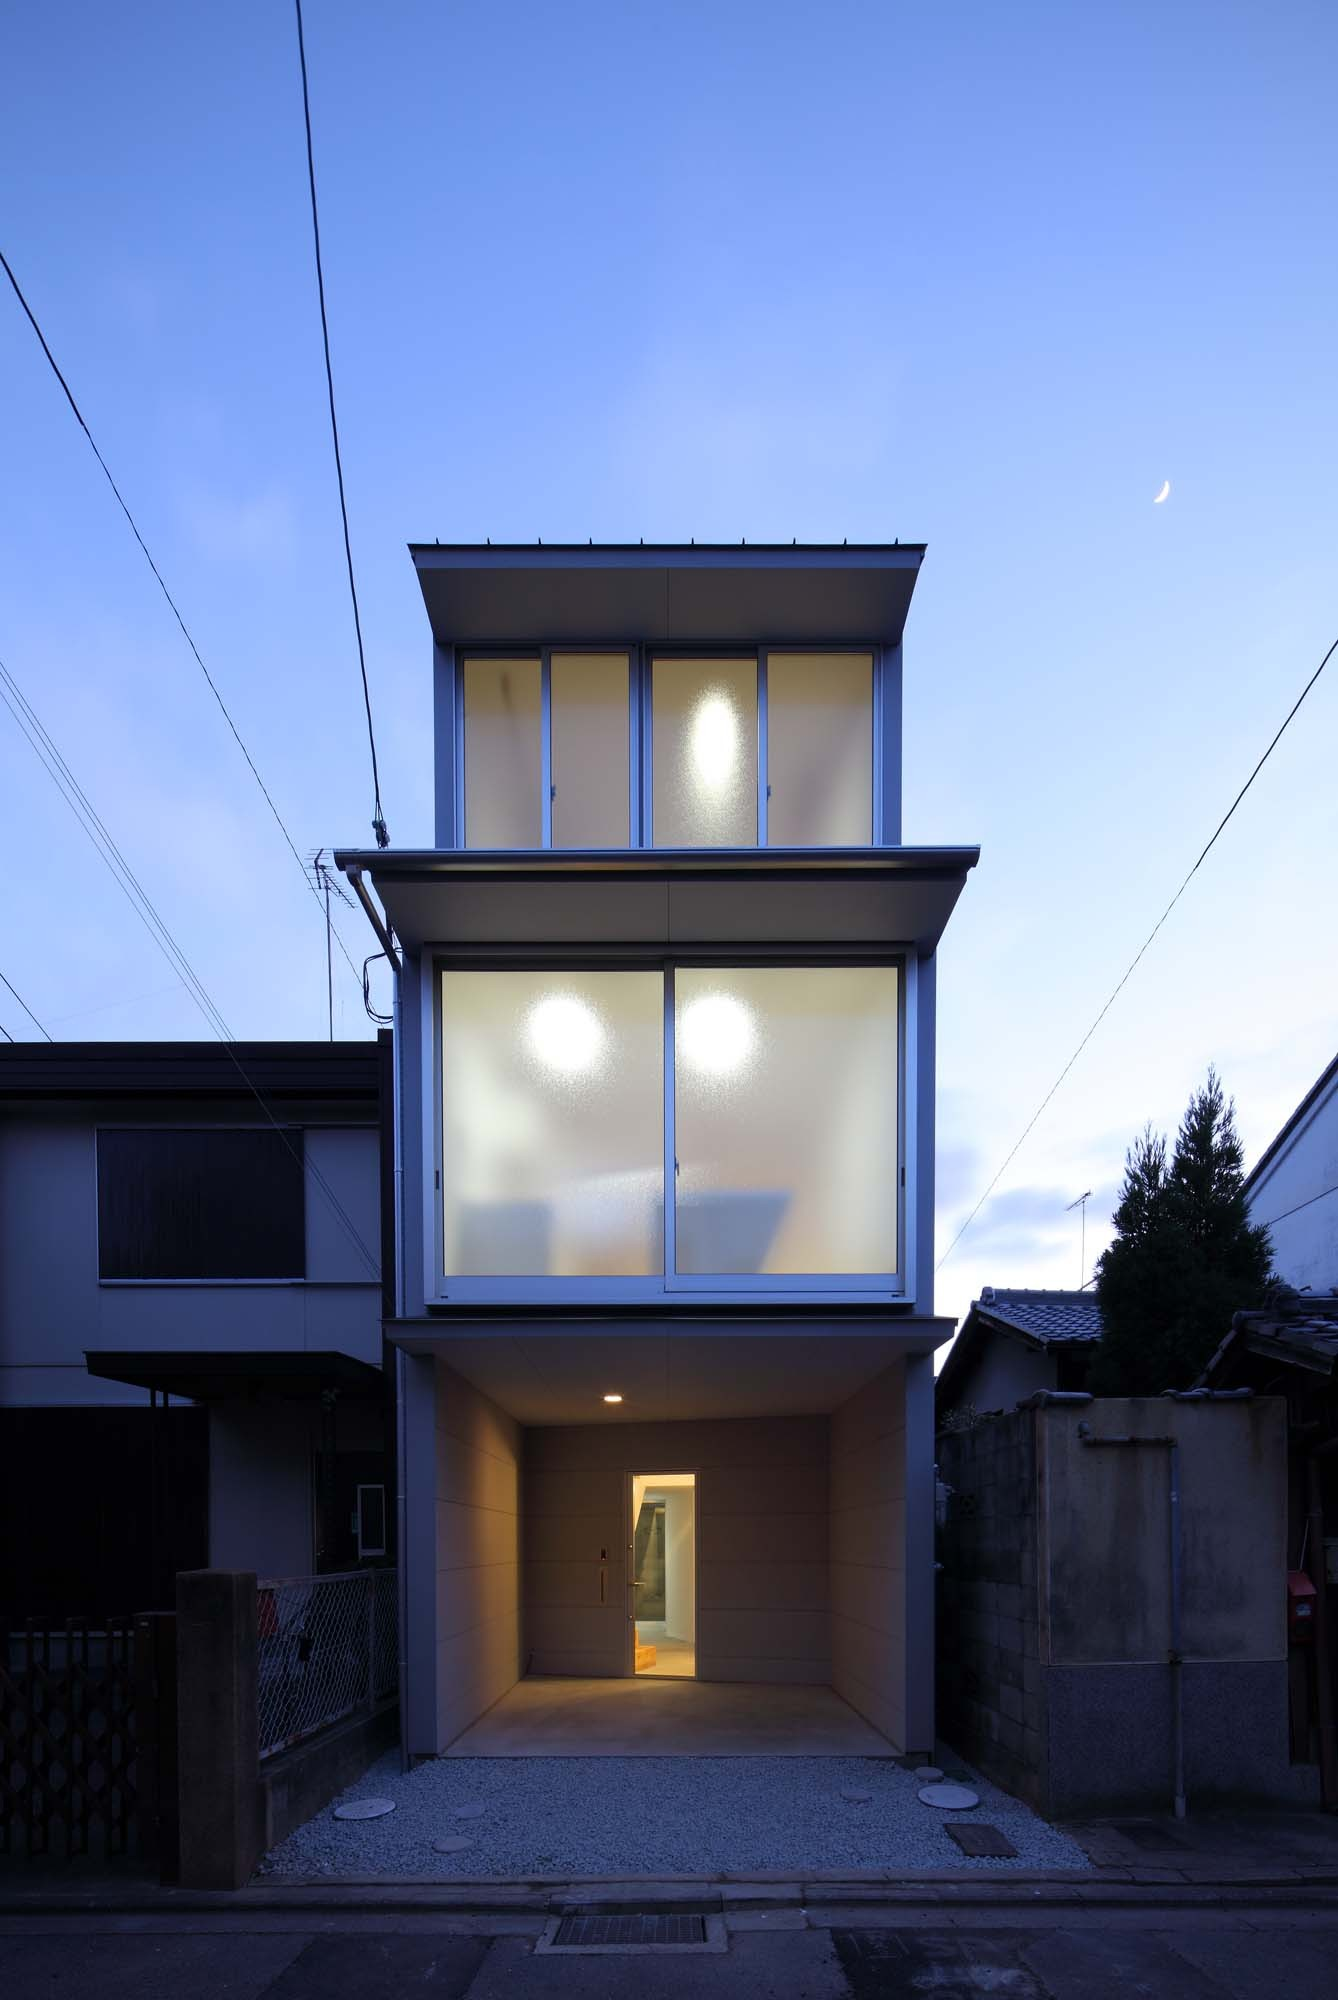 New Kyoto Town House 2 / Alphaville Architects